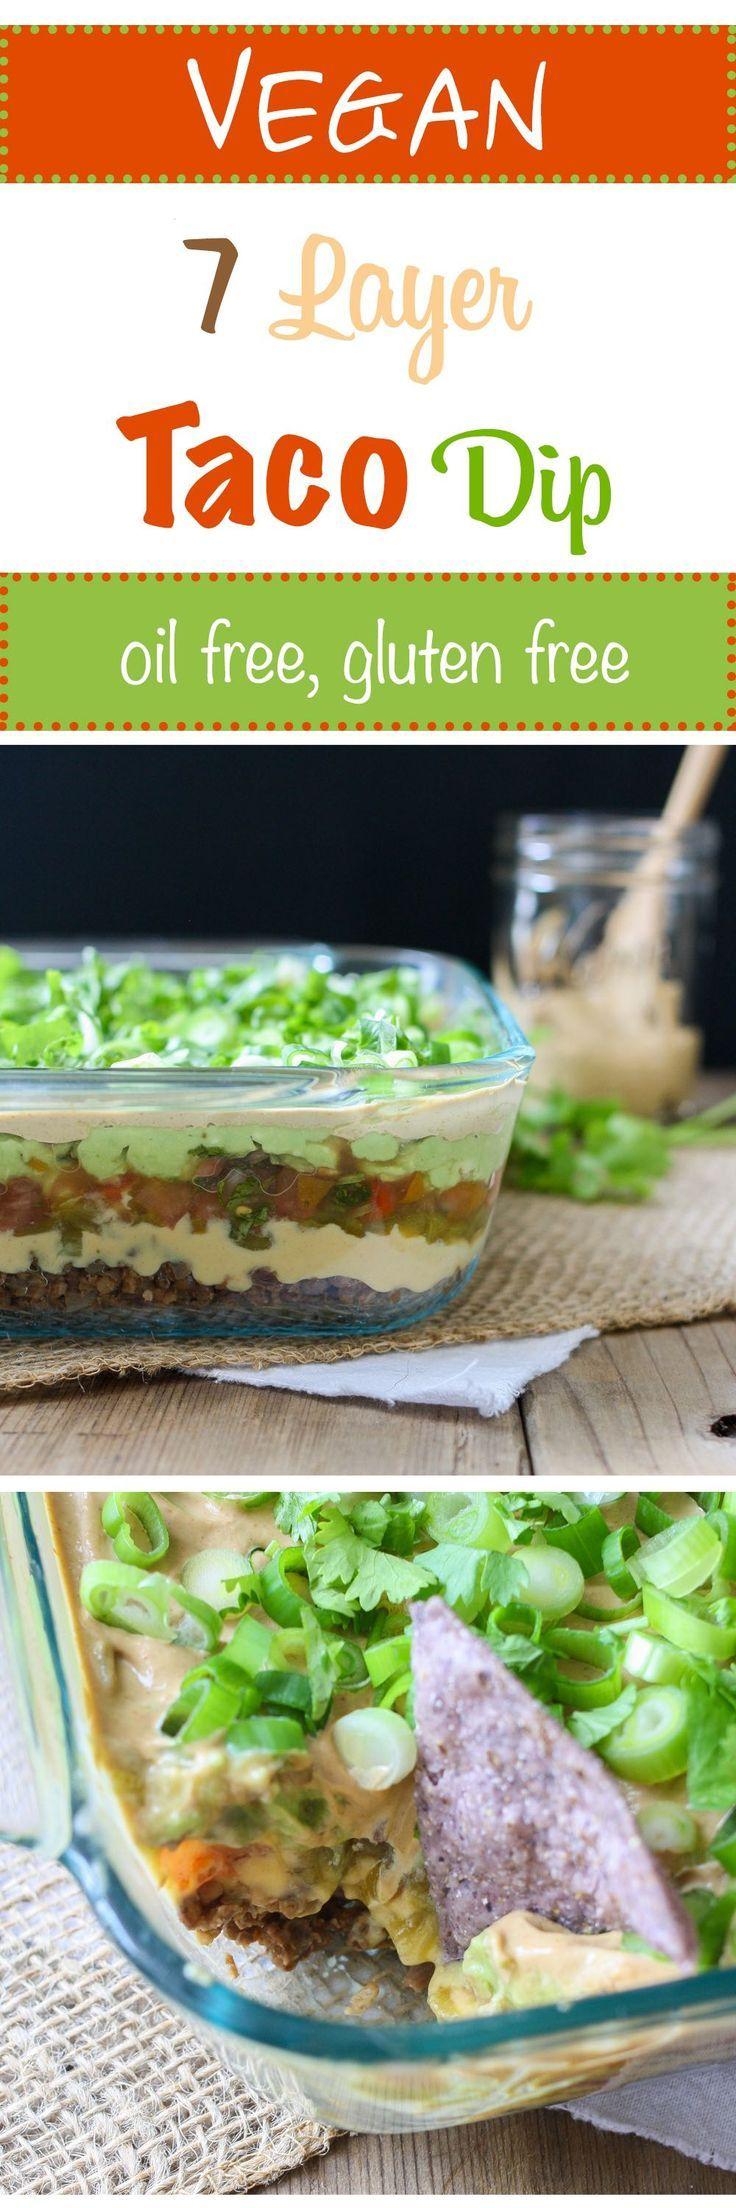 7 Layer Taco Dip | www.veggiedontbite.com | #vegan #plantbased #appetizer #mexican